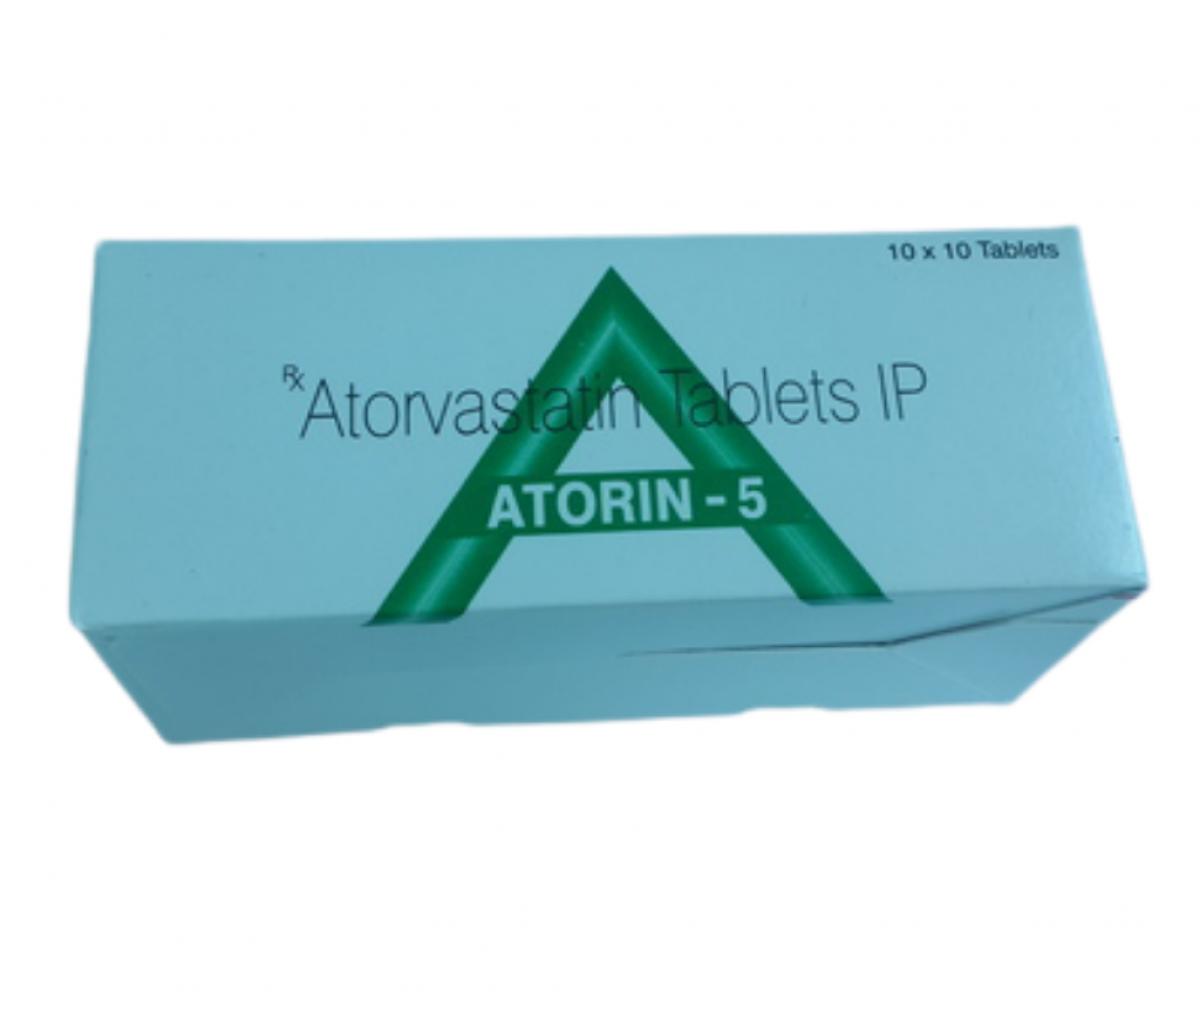 Atorin 5mg IP Tablet